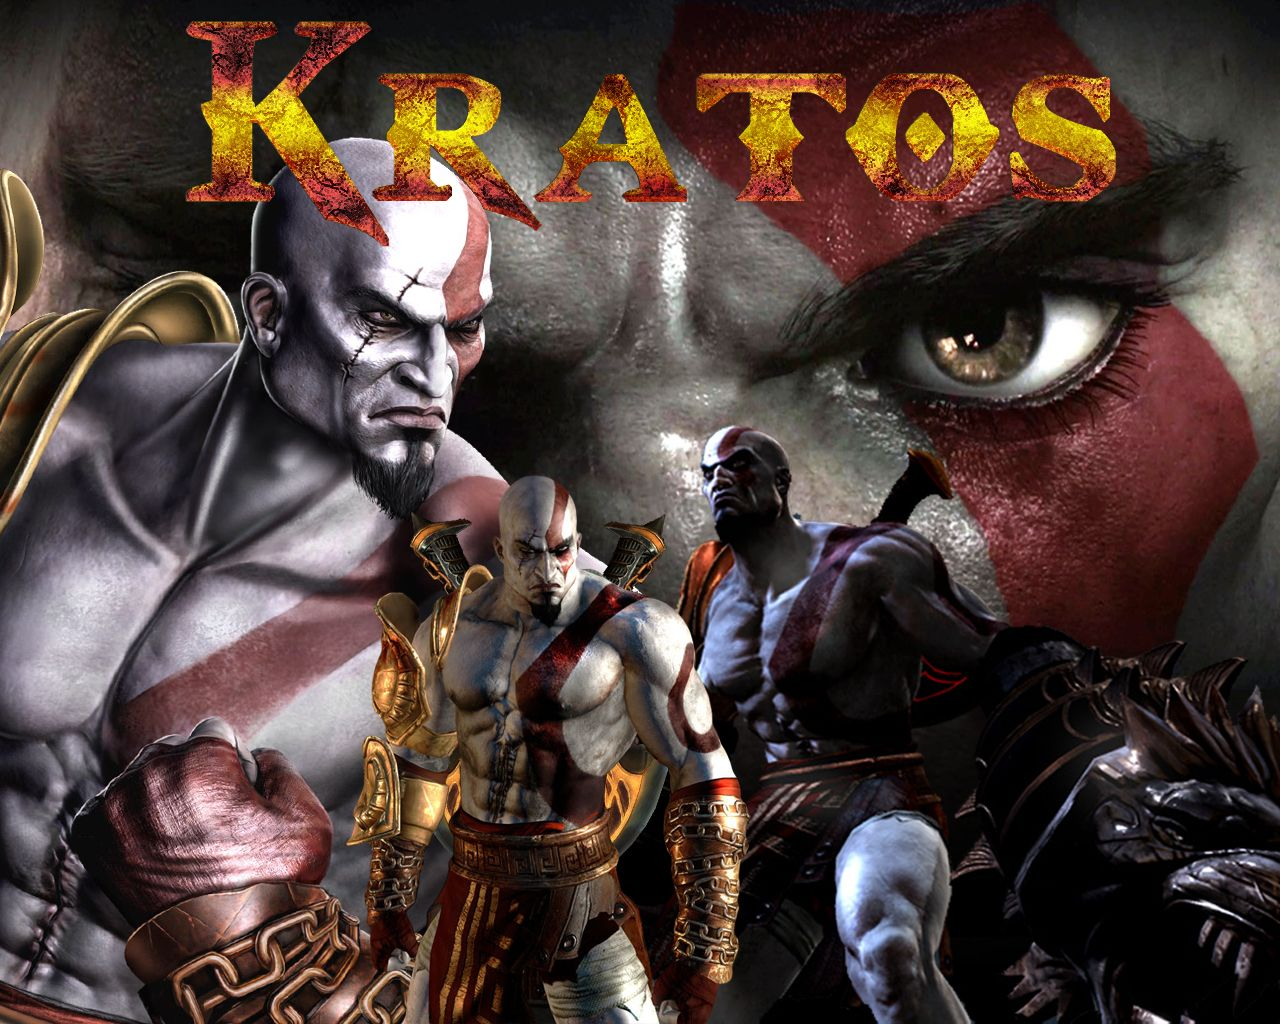 kratos god of war   god of war 3 kratos wallpaperrodrigovg3